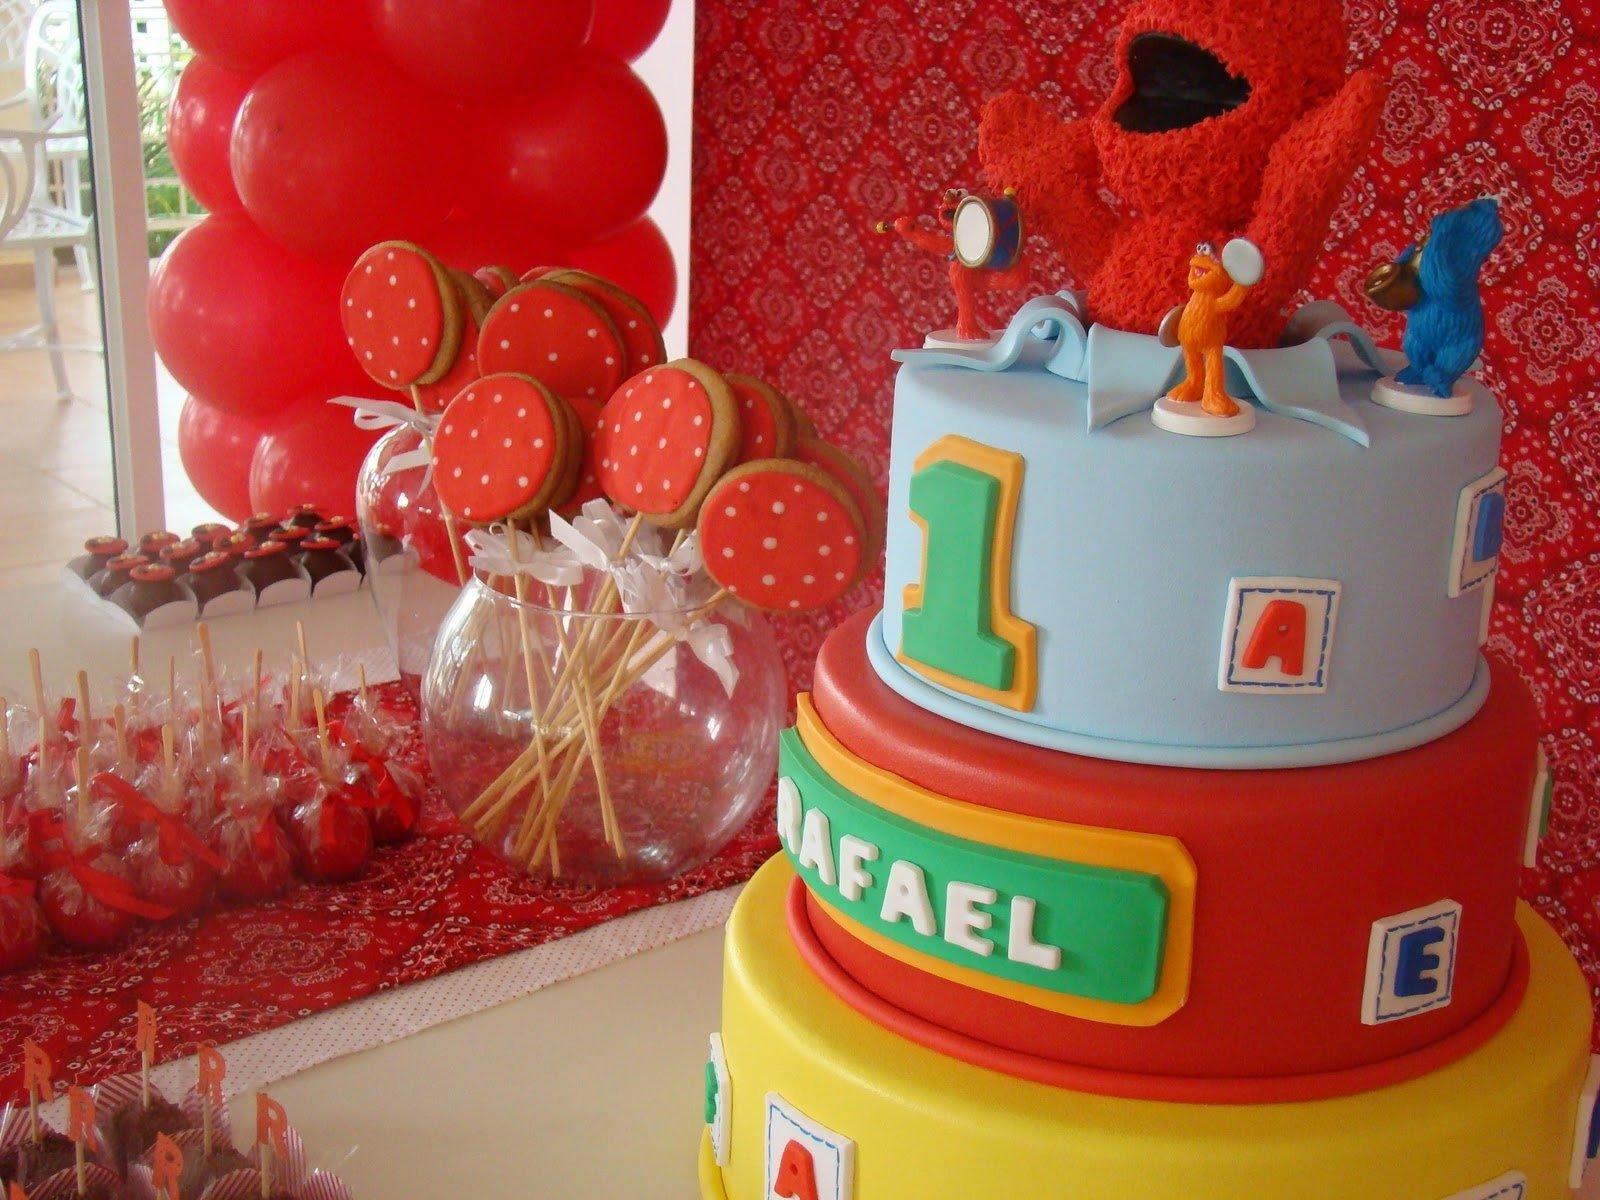 10 Amazing Elmo Themed Birthday Party Ideas elmo birthday party ideas party city hours 2020